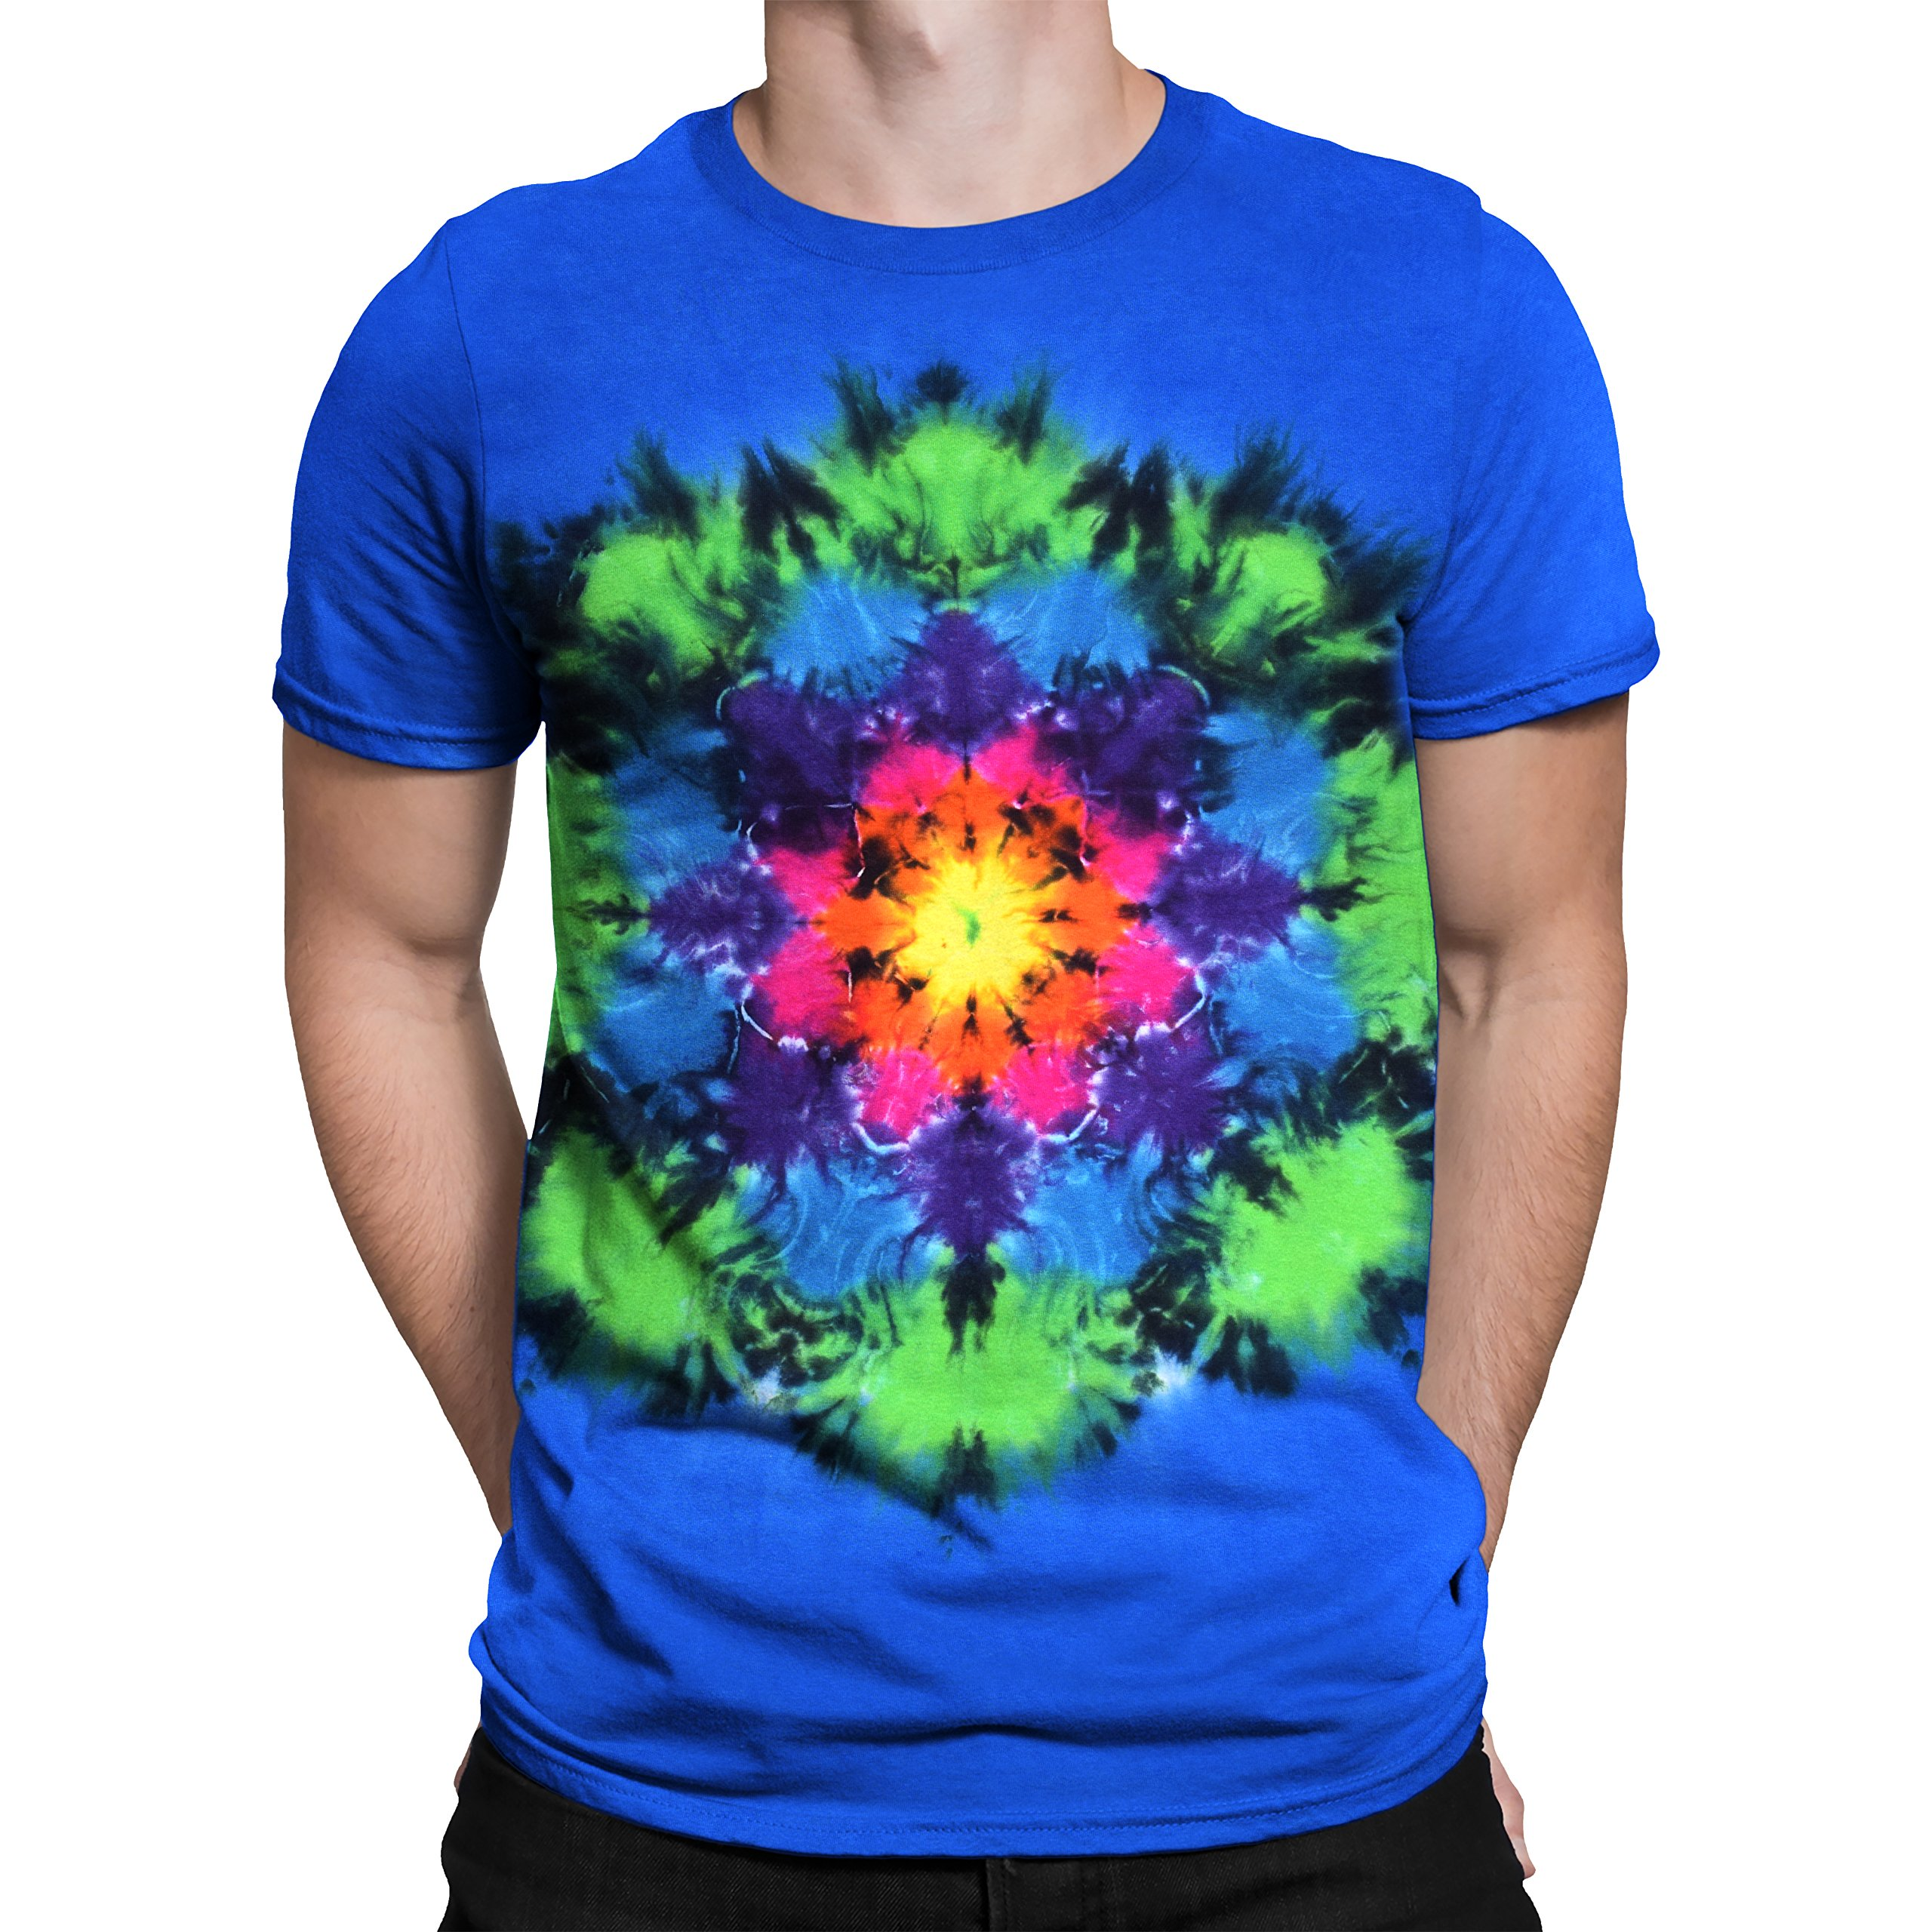 Liquid Blue Unprinted Rainbow Mandala Tie Dye Short Sleeve T-Shirt